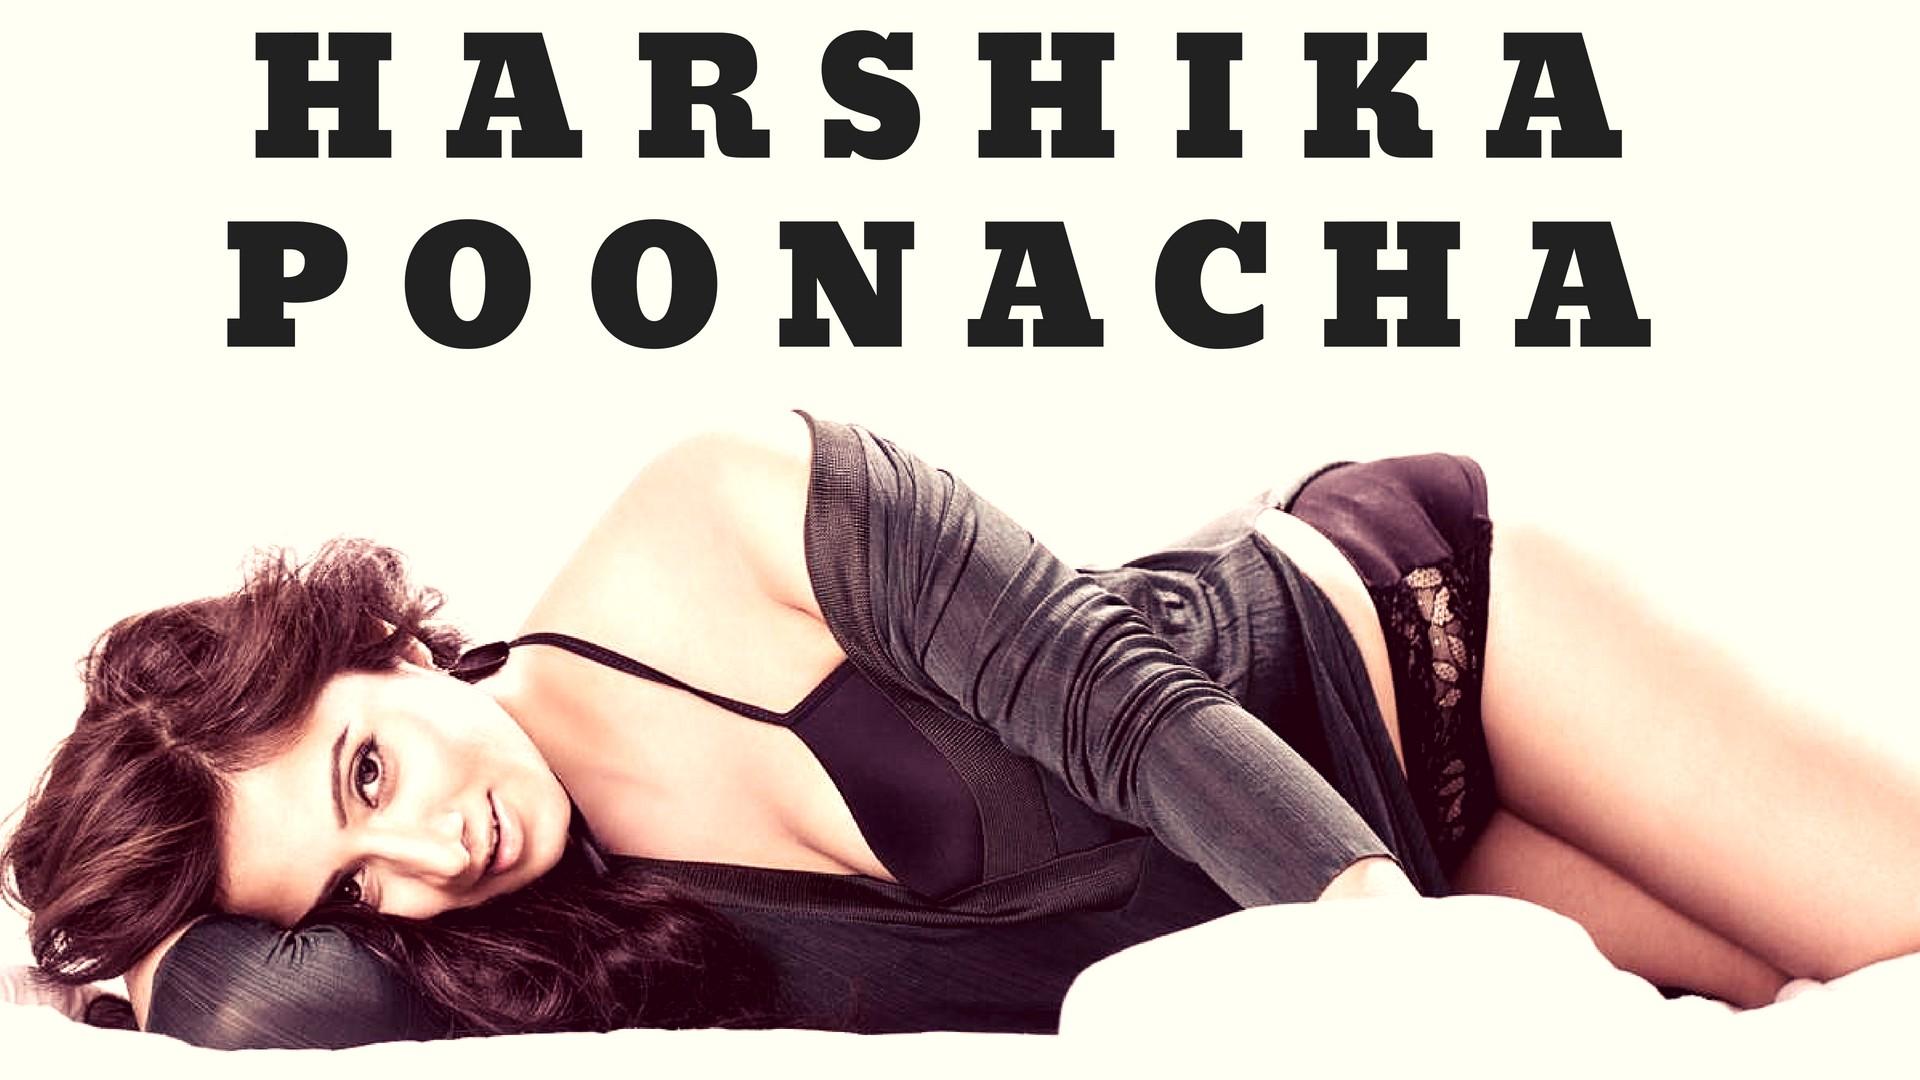 Hot Harshika Poonacha Pictures - Sexy Actress Pictures | Hot Actress Pictures - ActressSnaps.com